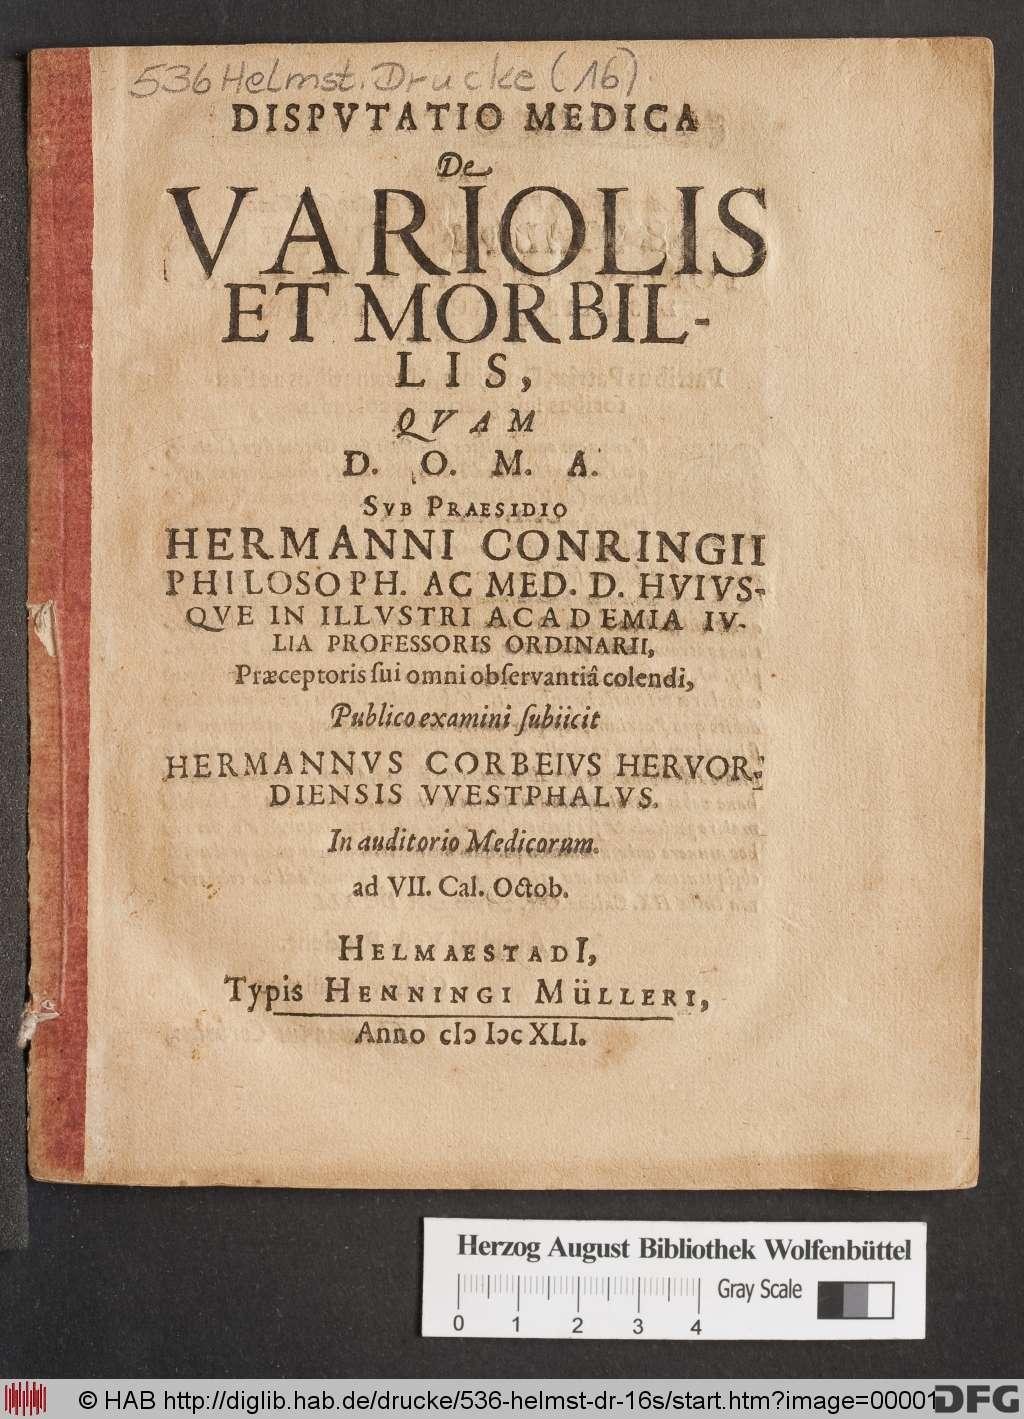 http://diglib.hab.de/drucke/536-helmst-dr-16s/00001.jpg